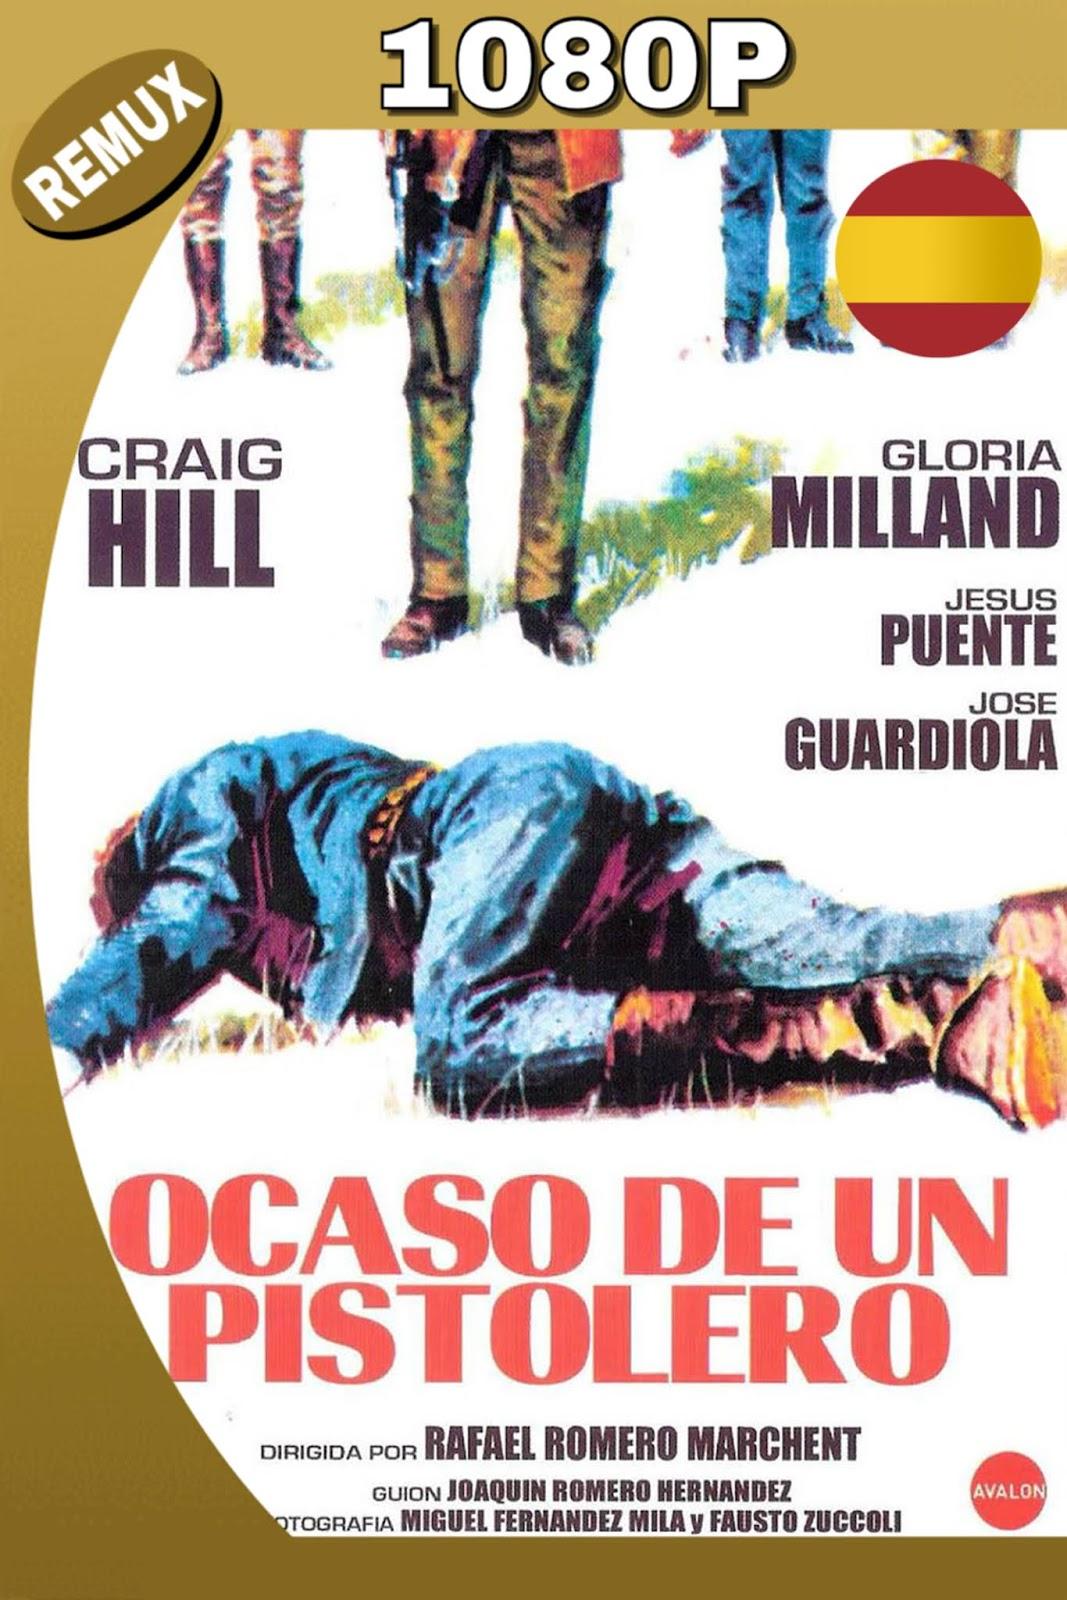 OCASO DE UN PISTOLERO 1965 ESP-ING HD BDREMUX 1080P 21GB.mkv